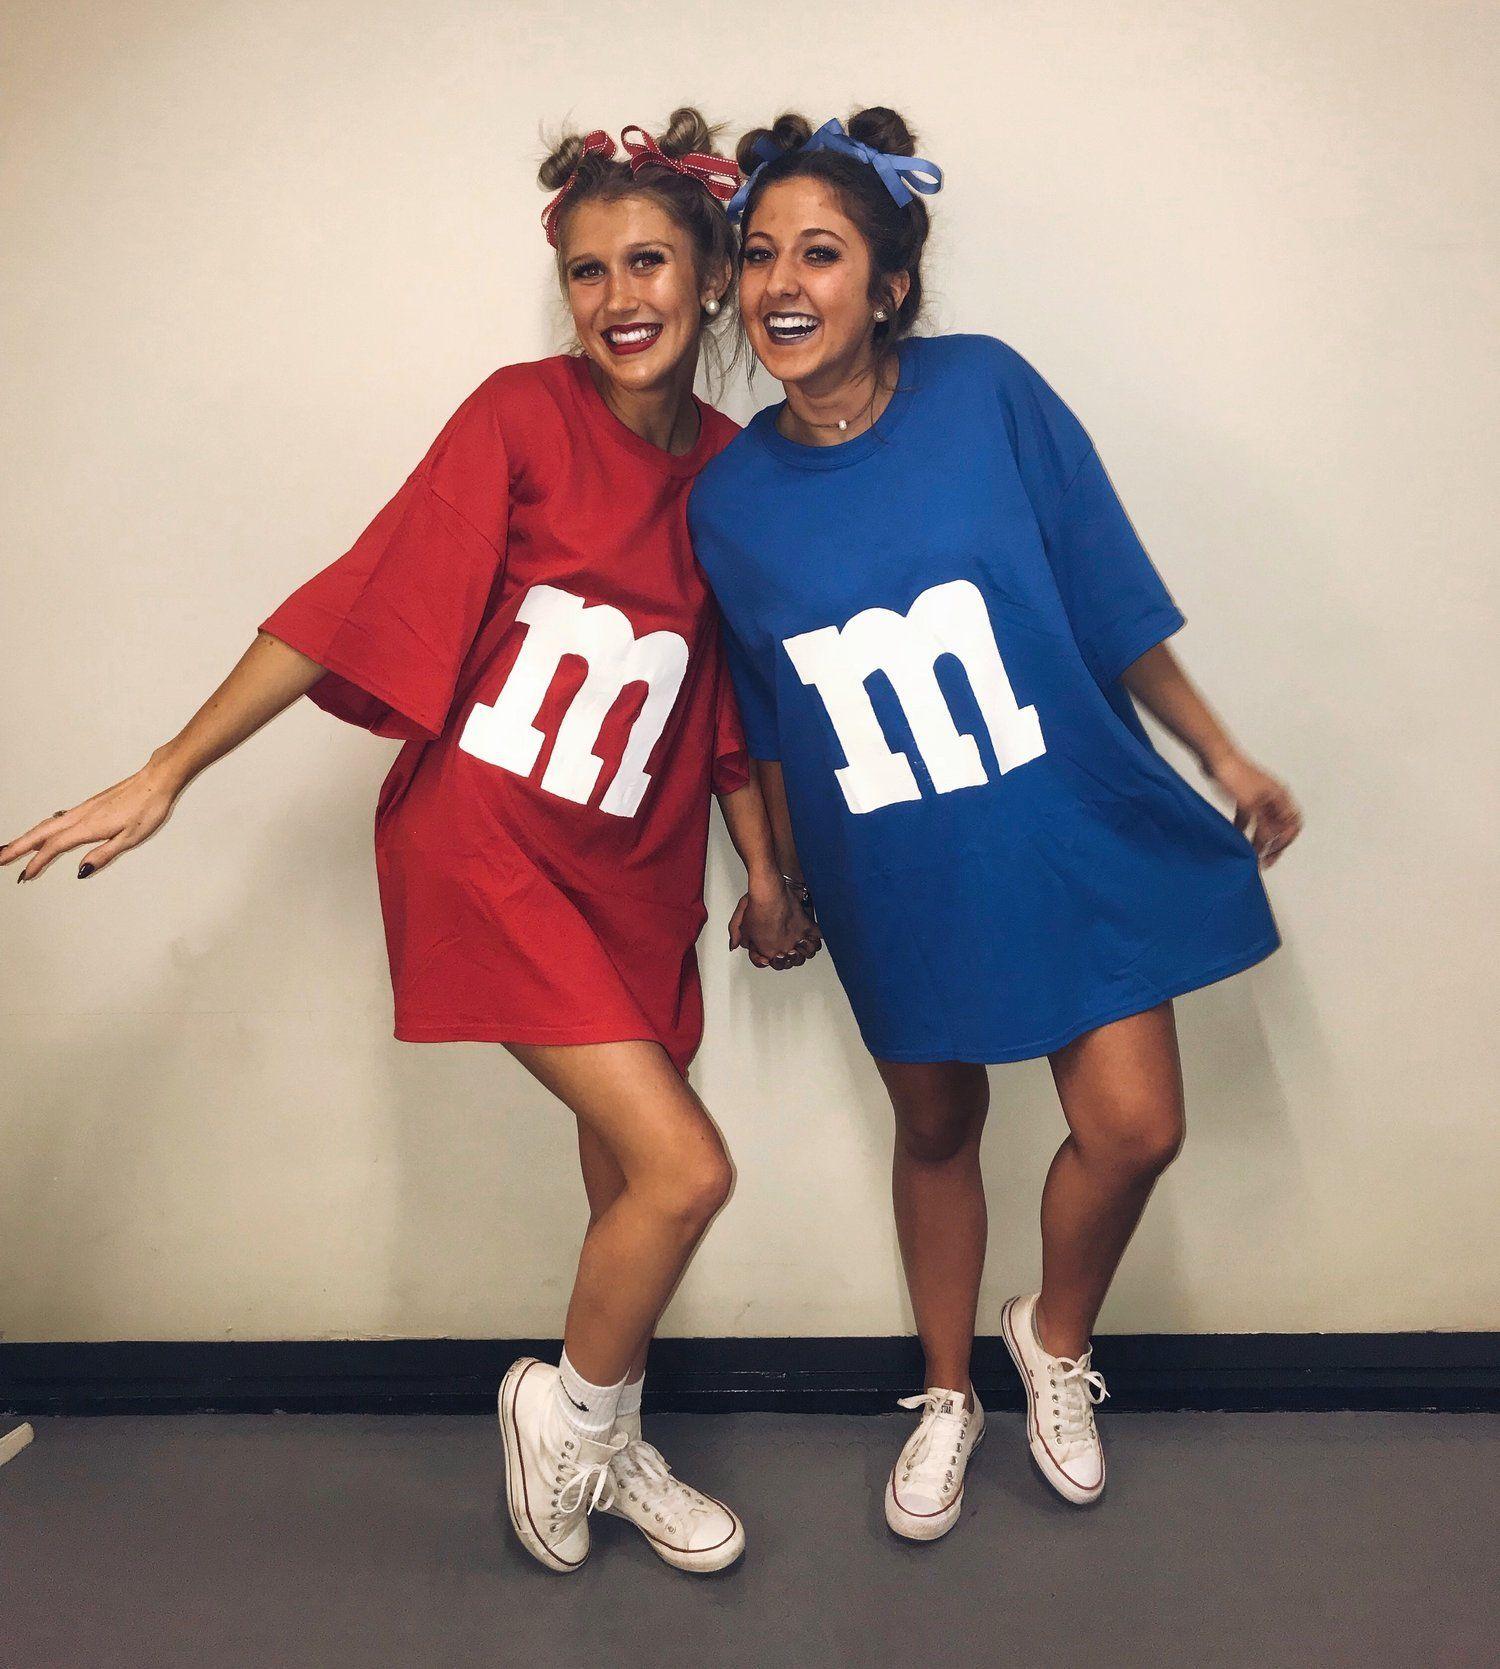 partner kostüm karneval freundinnen in 2020 | M&m kostüm